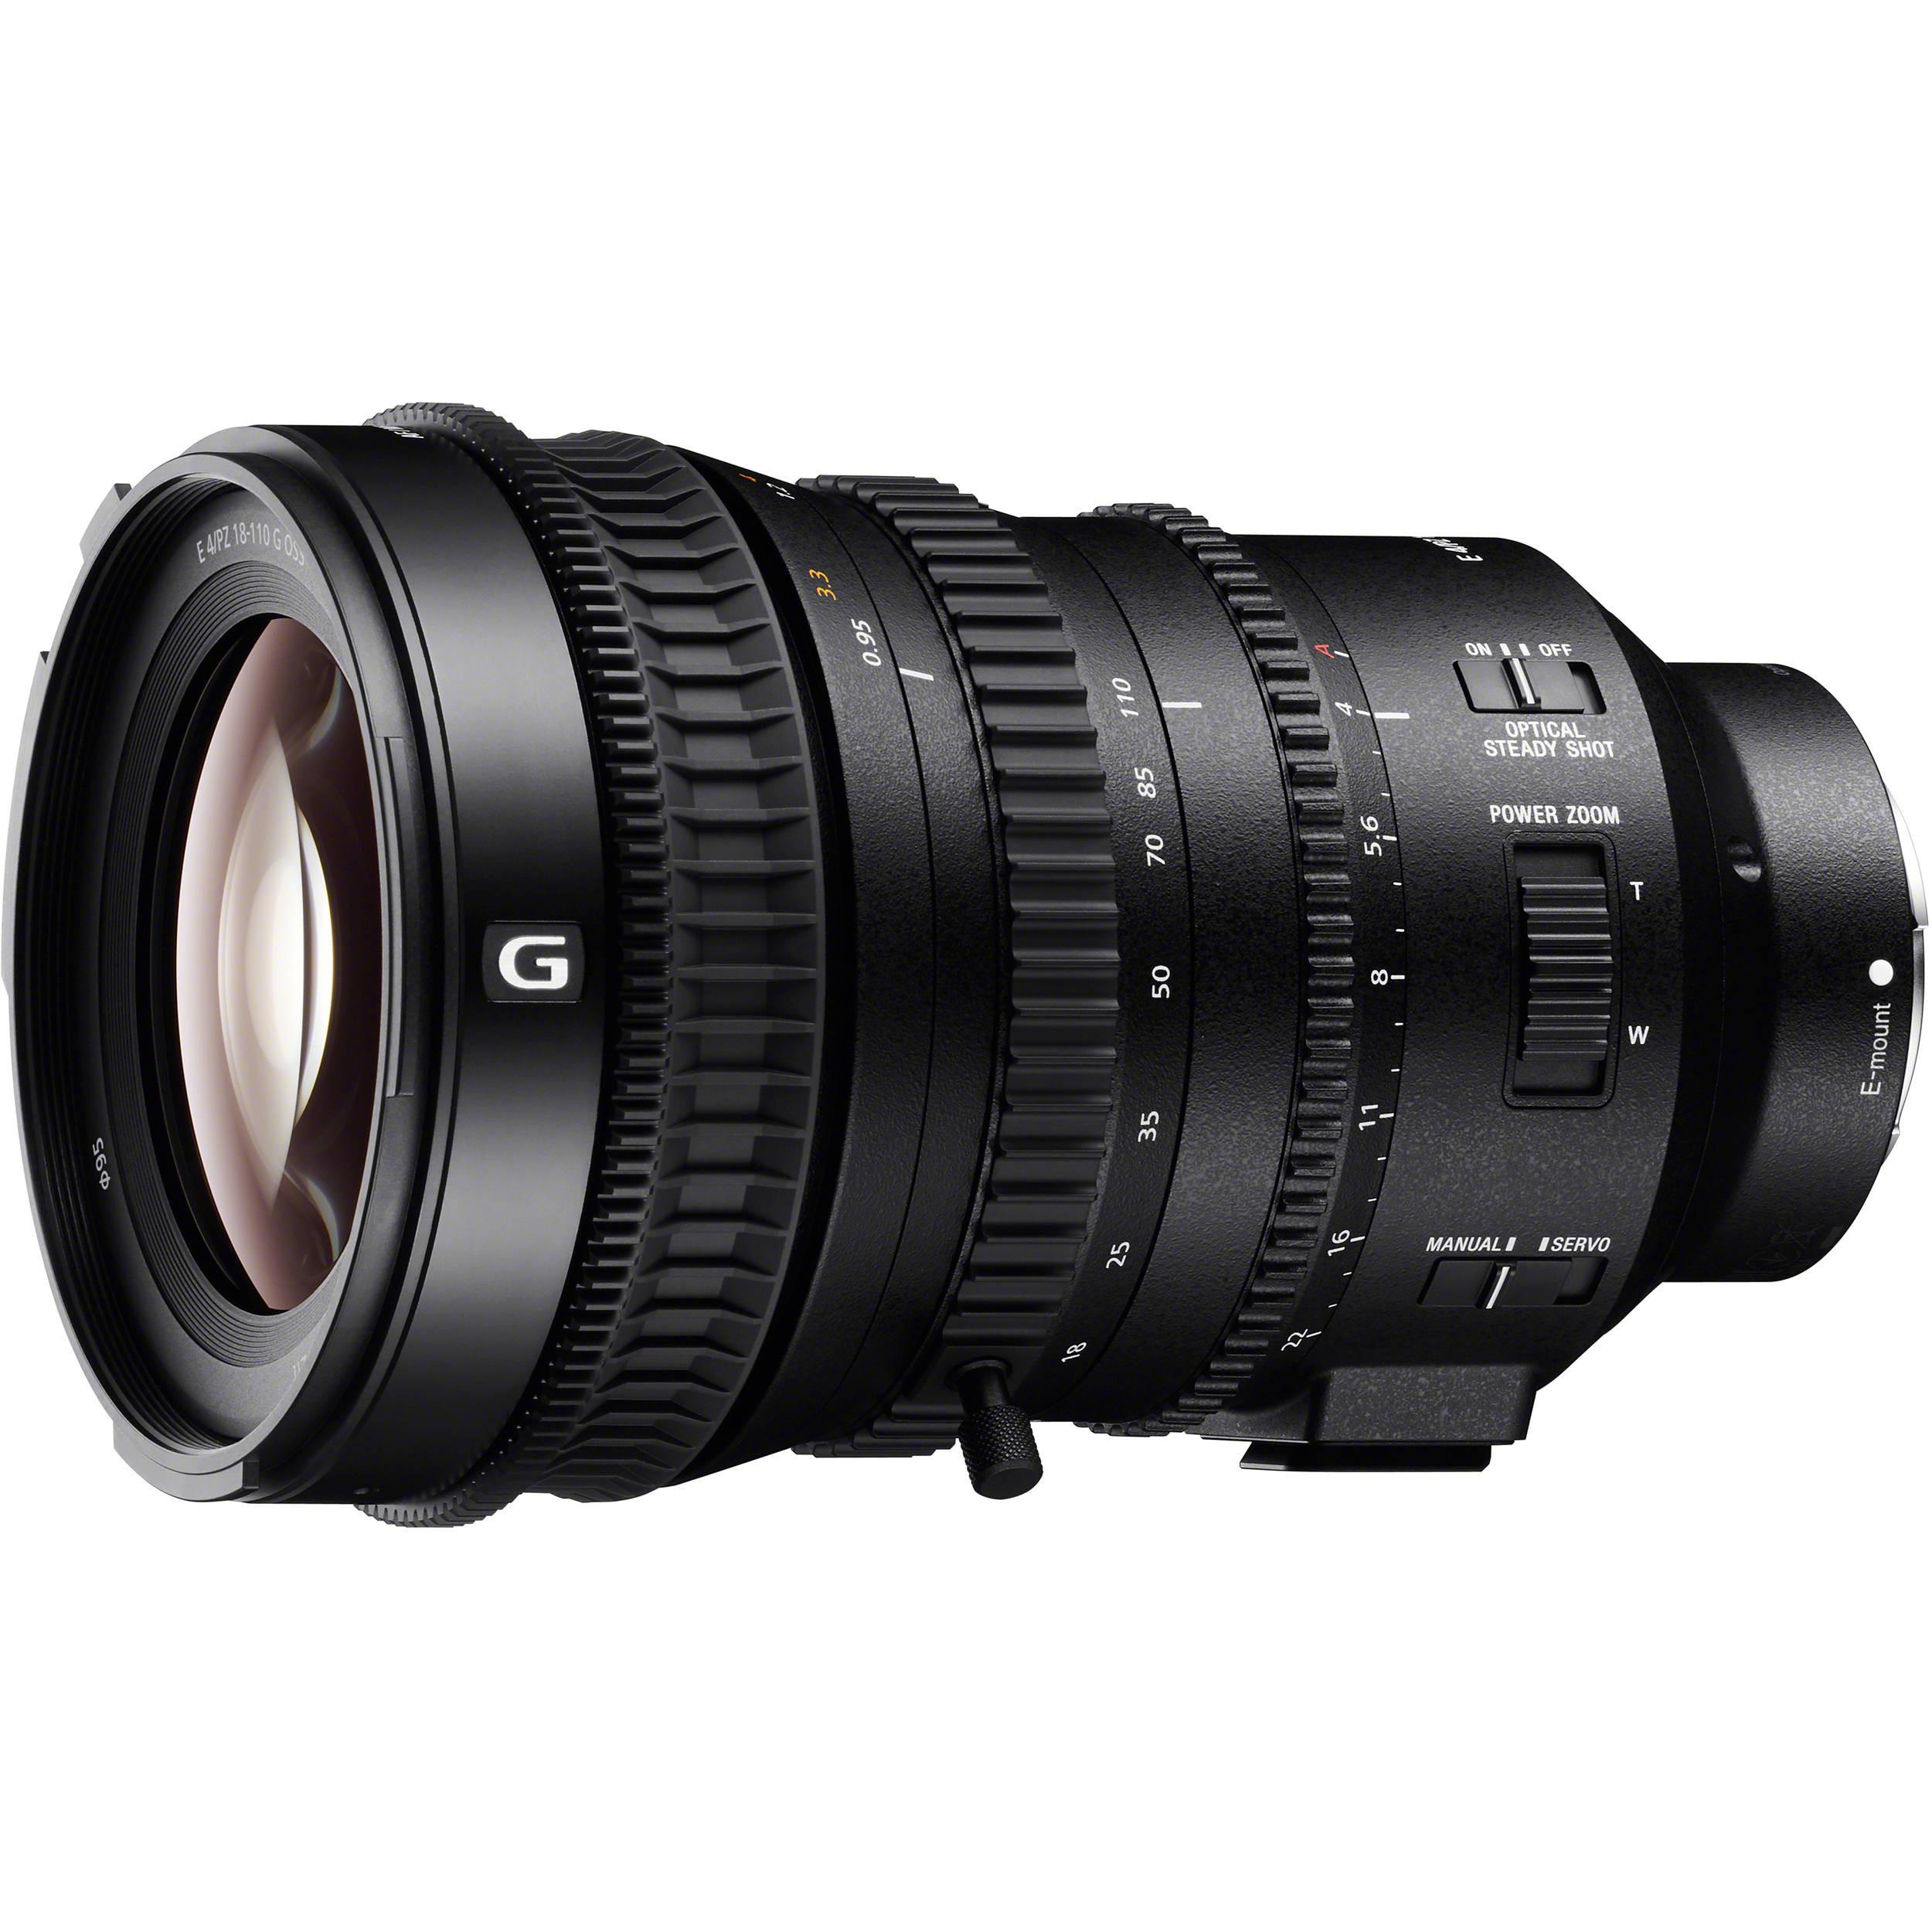 Объектив Sony E 18-110mm f/4.0 G Power Zoom